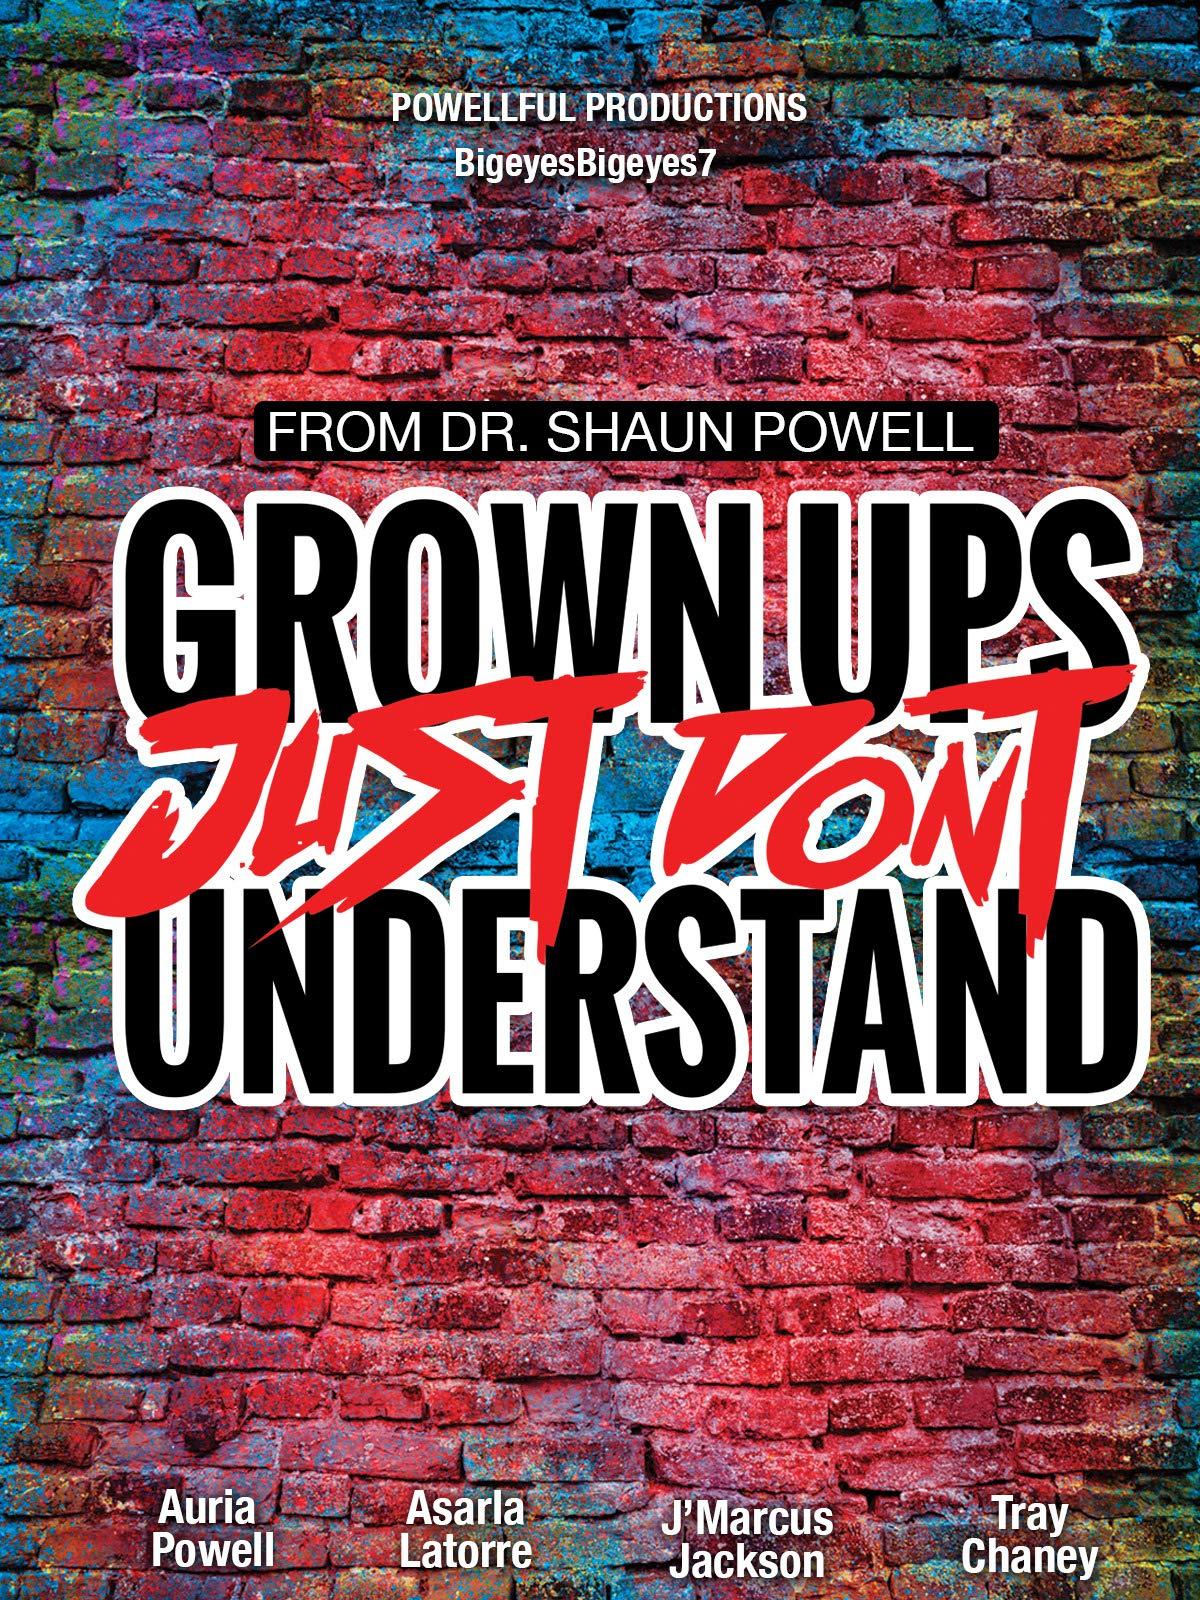 GrownUps Just Dont Understand